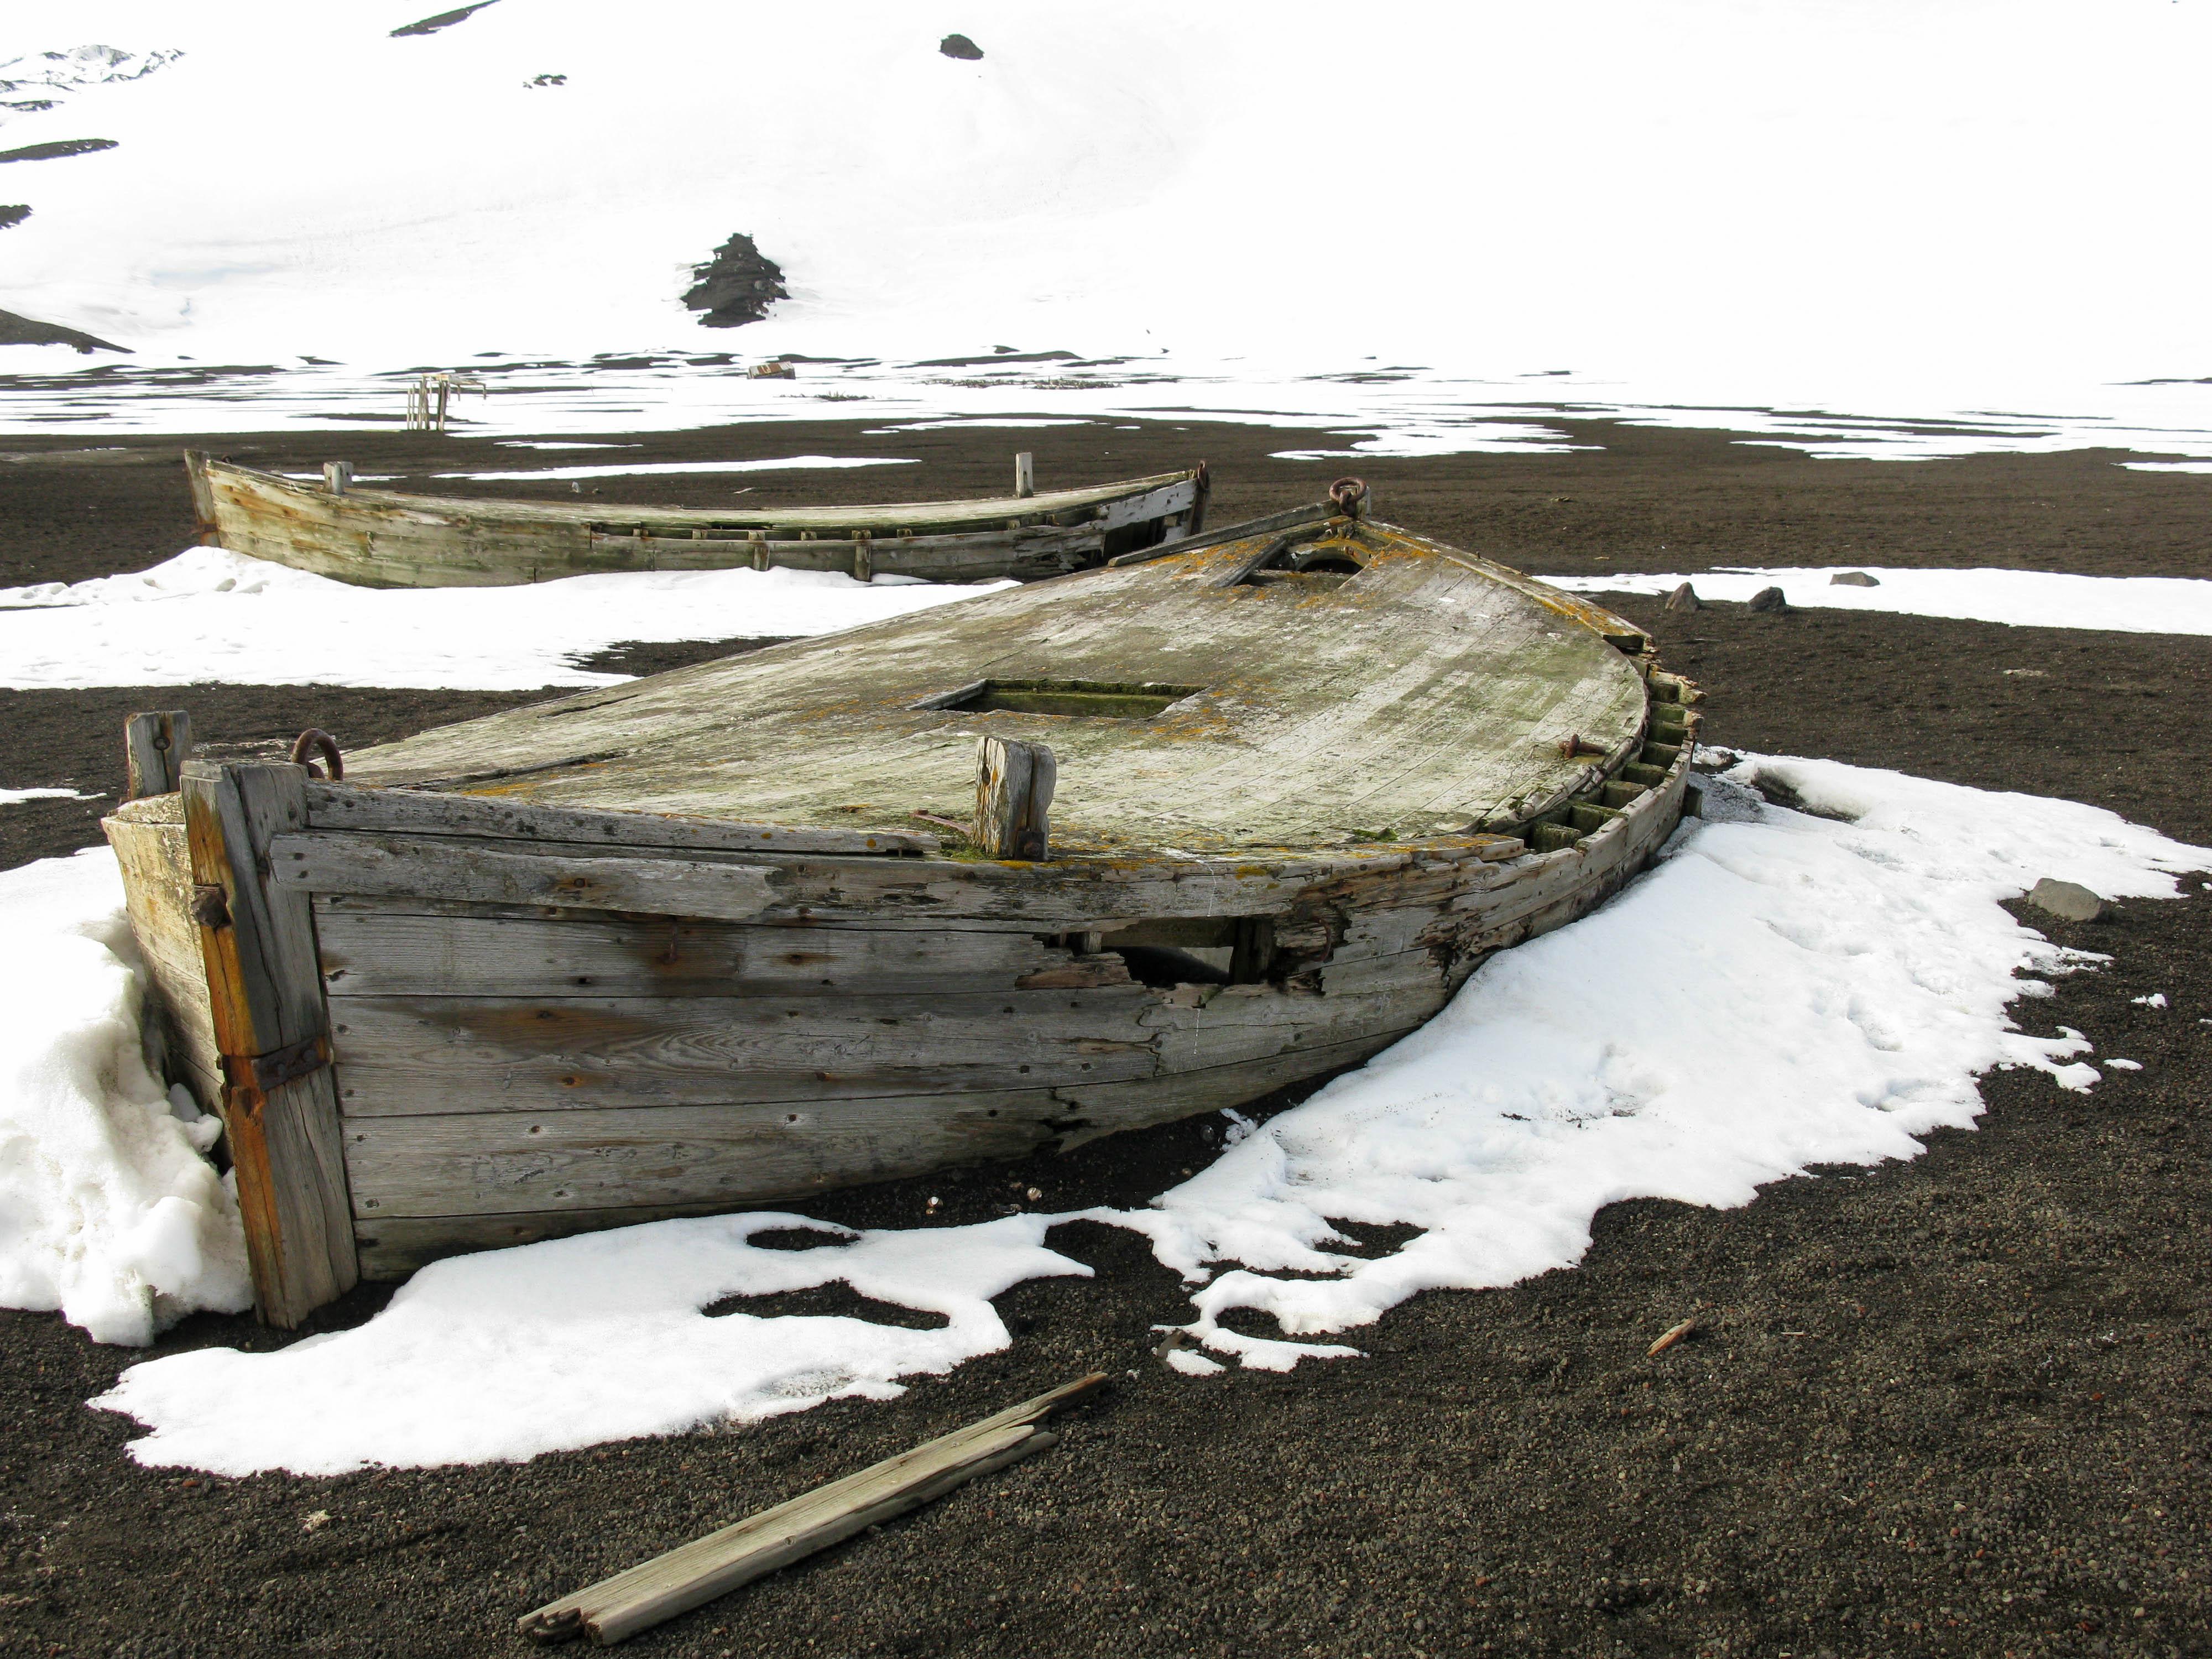 Jolles (water boats), Whaler's Bay, Deception Island